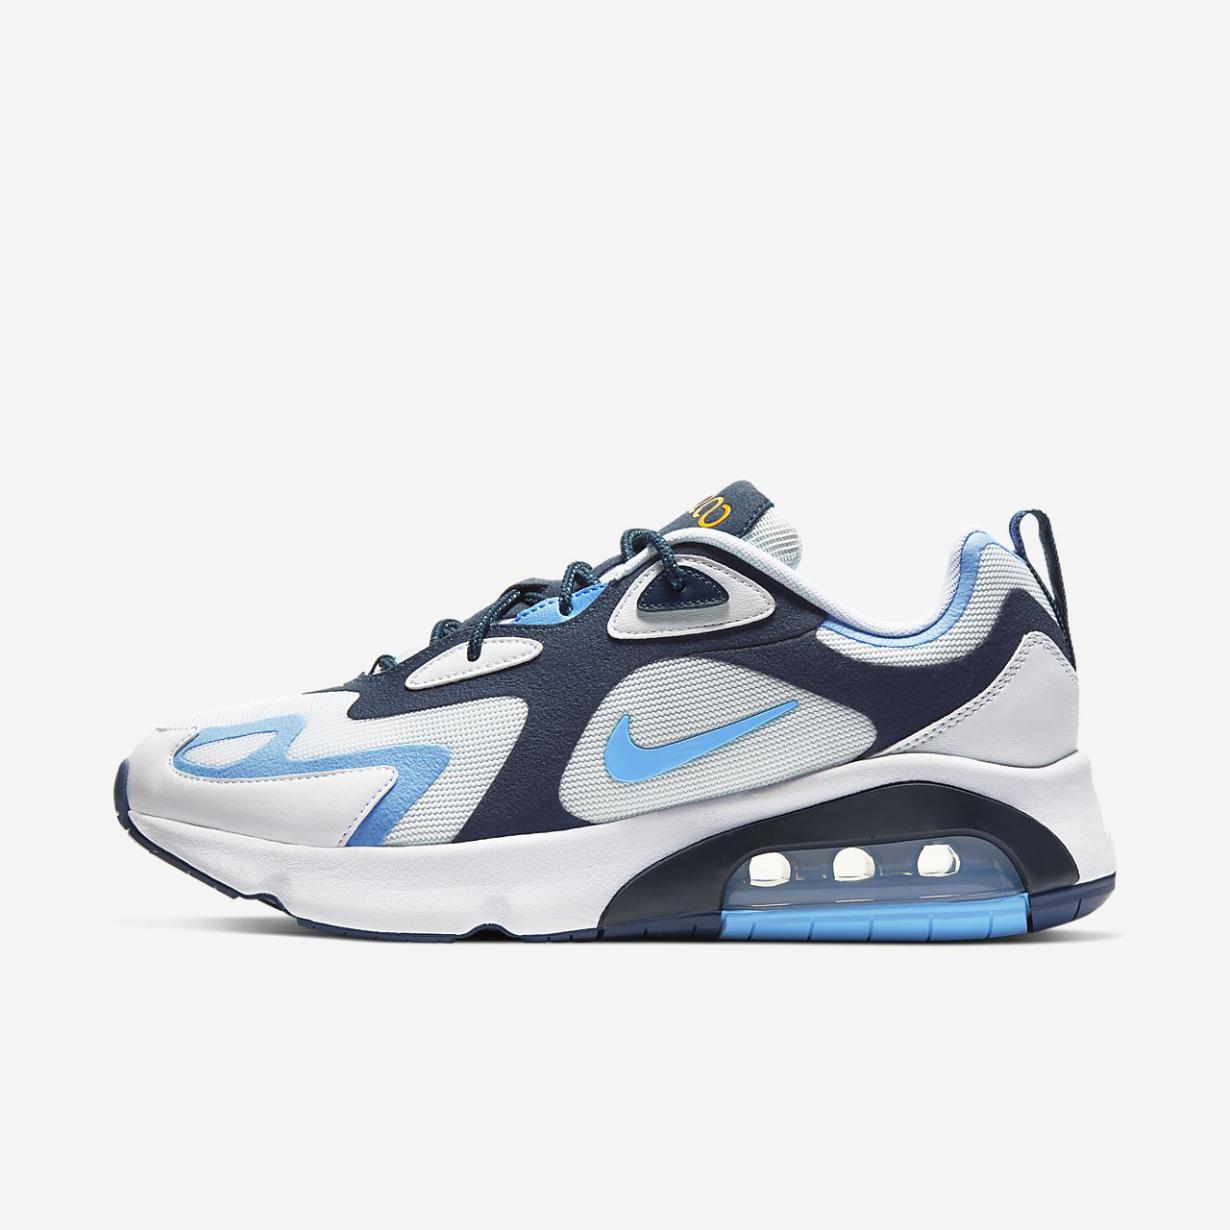 Lifestyle Homme | Air Max 200 Blanc/Bleu nuit marine/Or université/Bleu université | Nike < Gooddaytricities